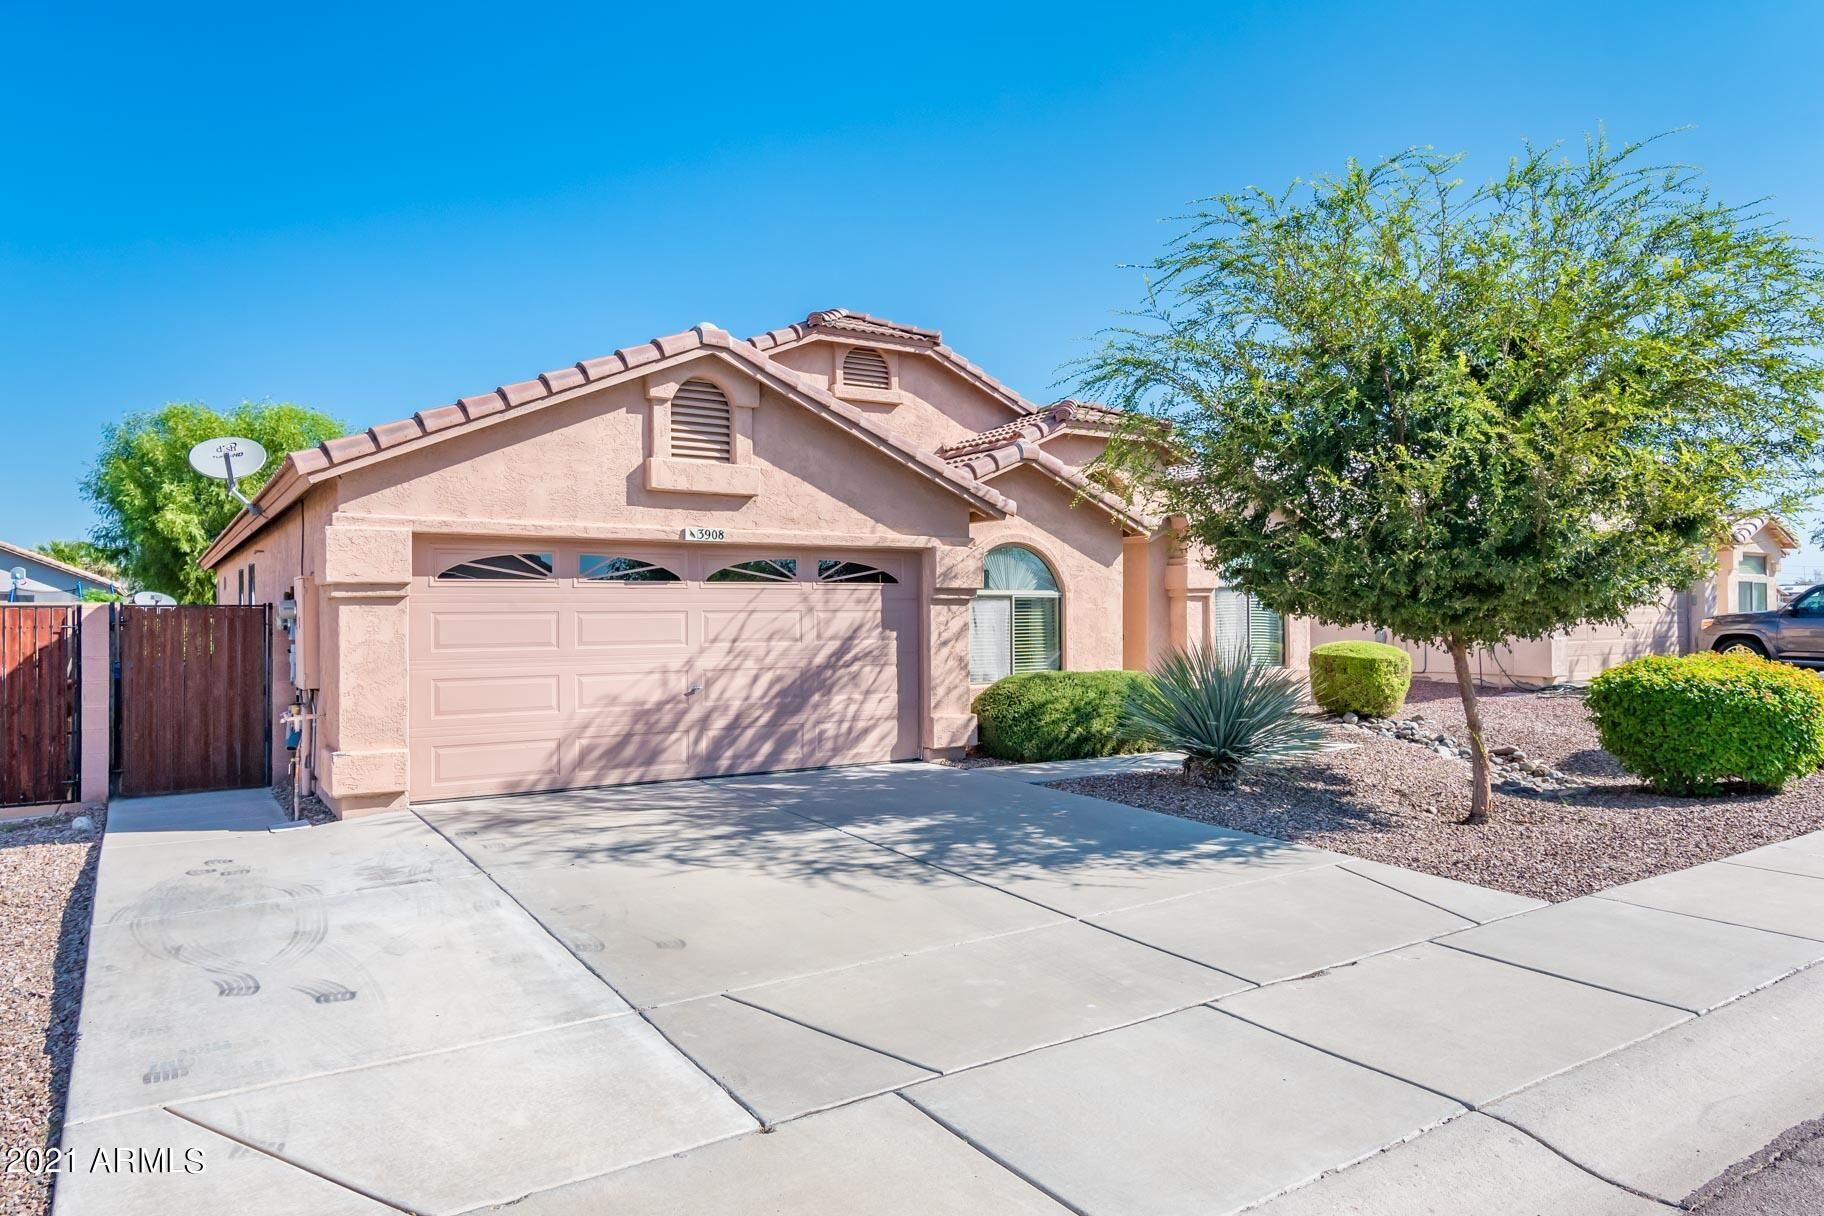 Photo of 3908 W QUAIL Avenue, Glendale, AZ 85308 (MLS # 6296750)